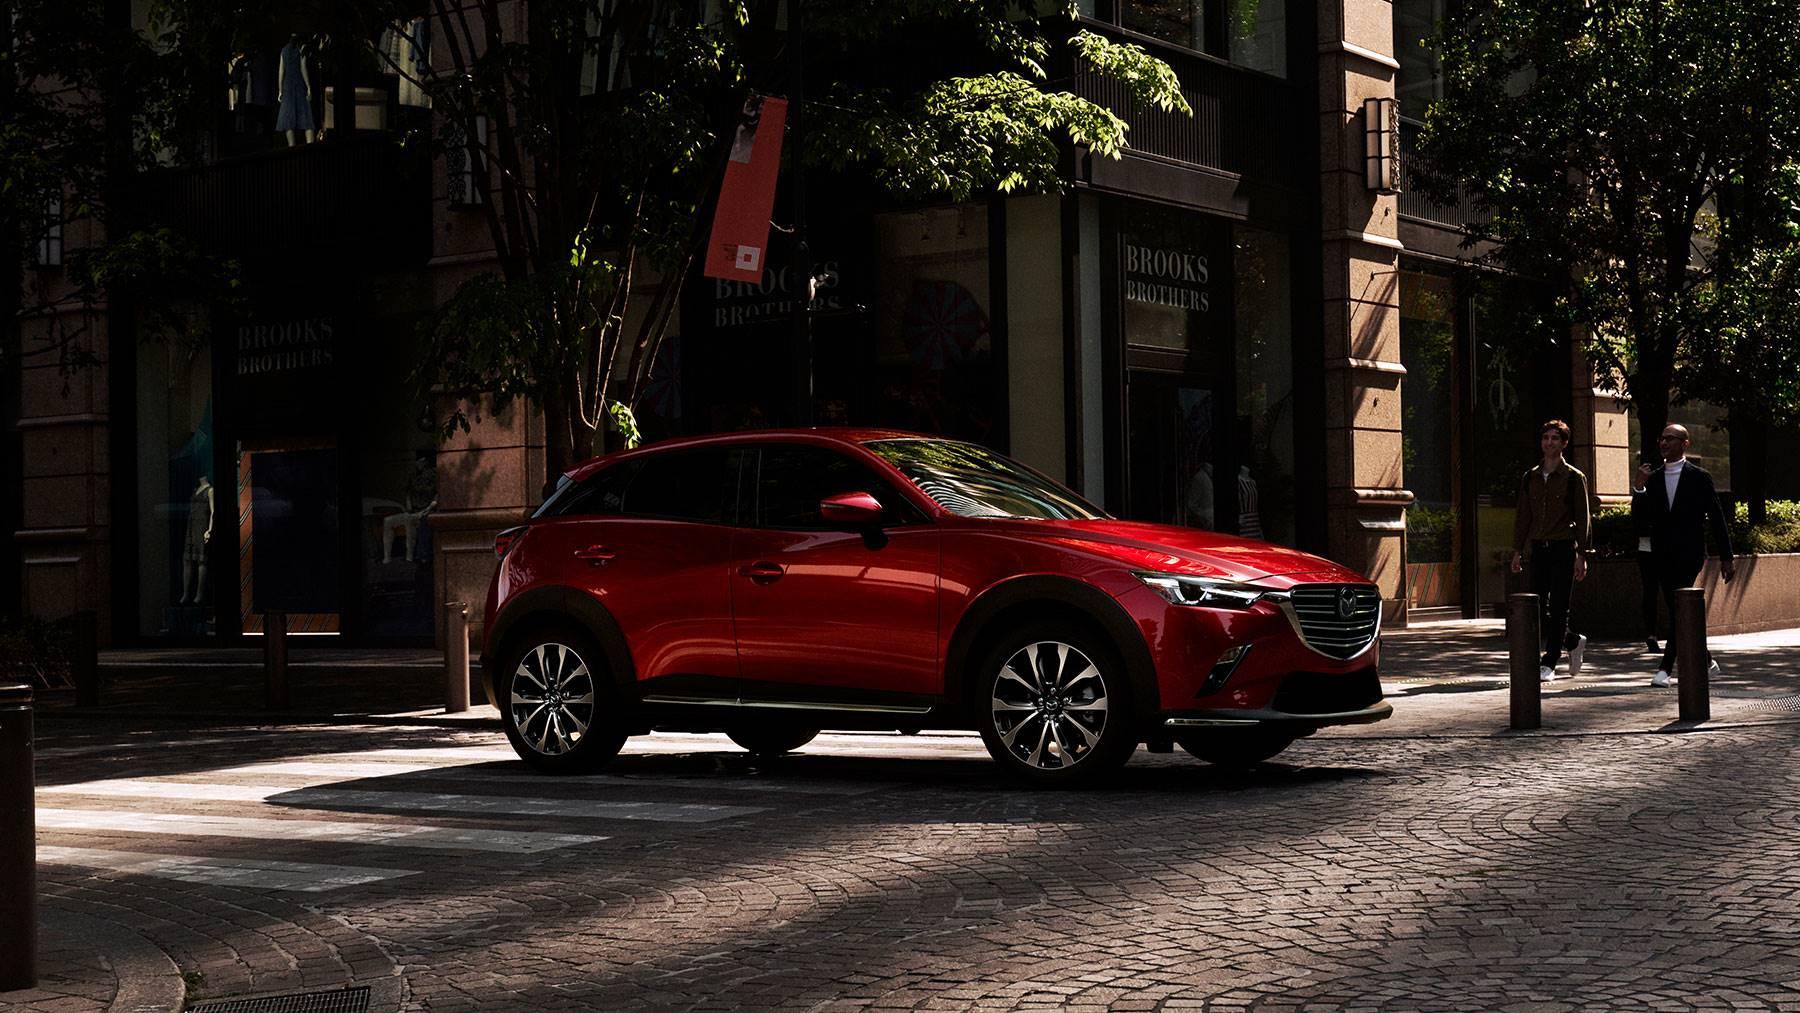 2019 Mazda CX-3 for Sale in Brighton, MI